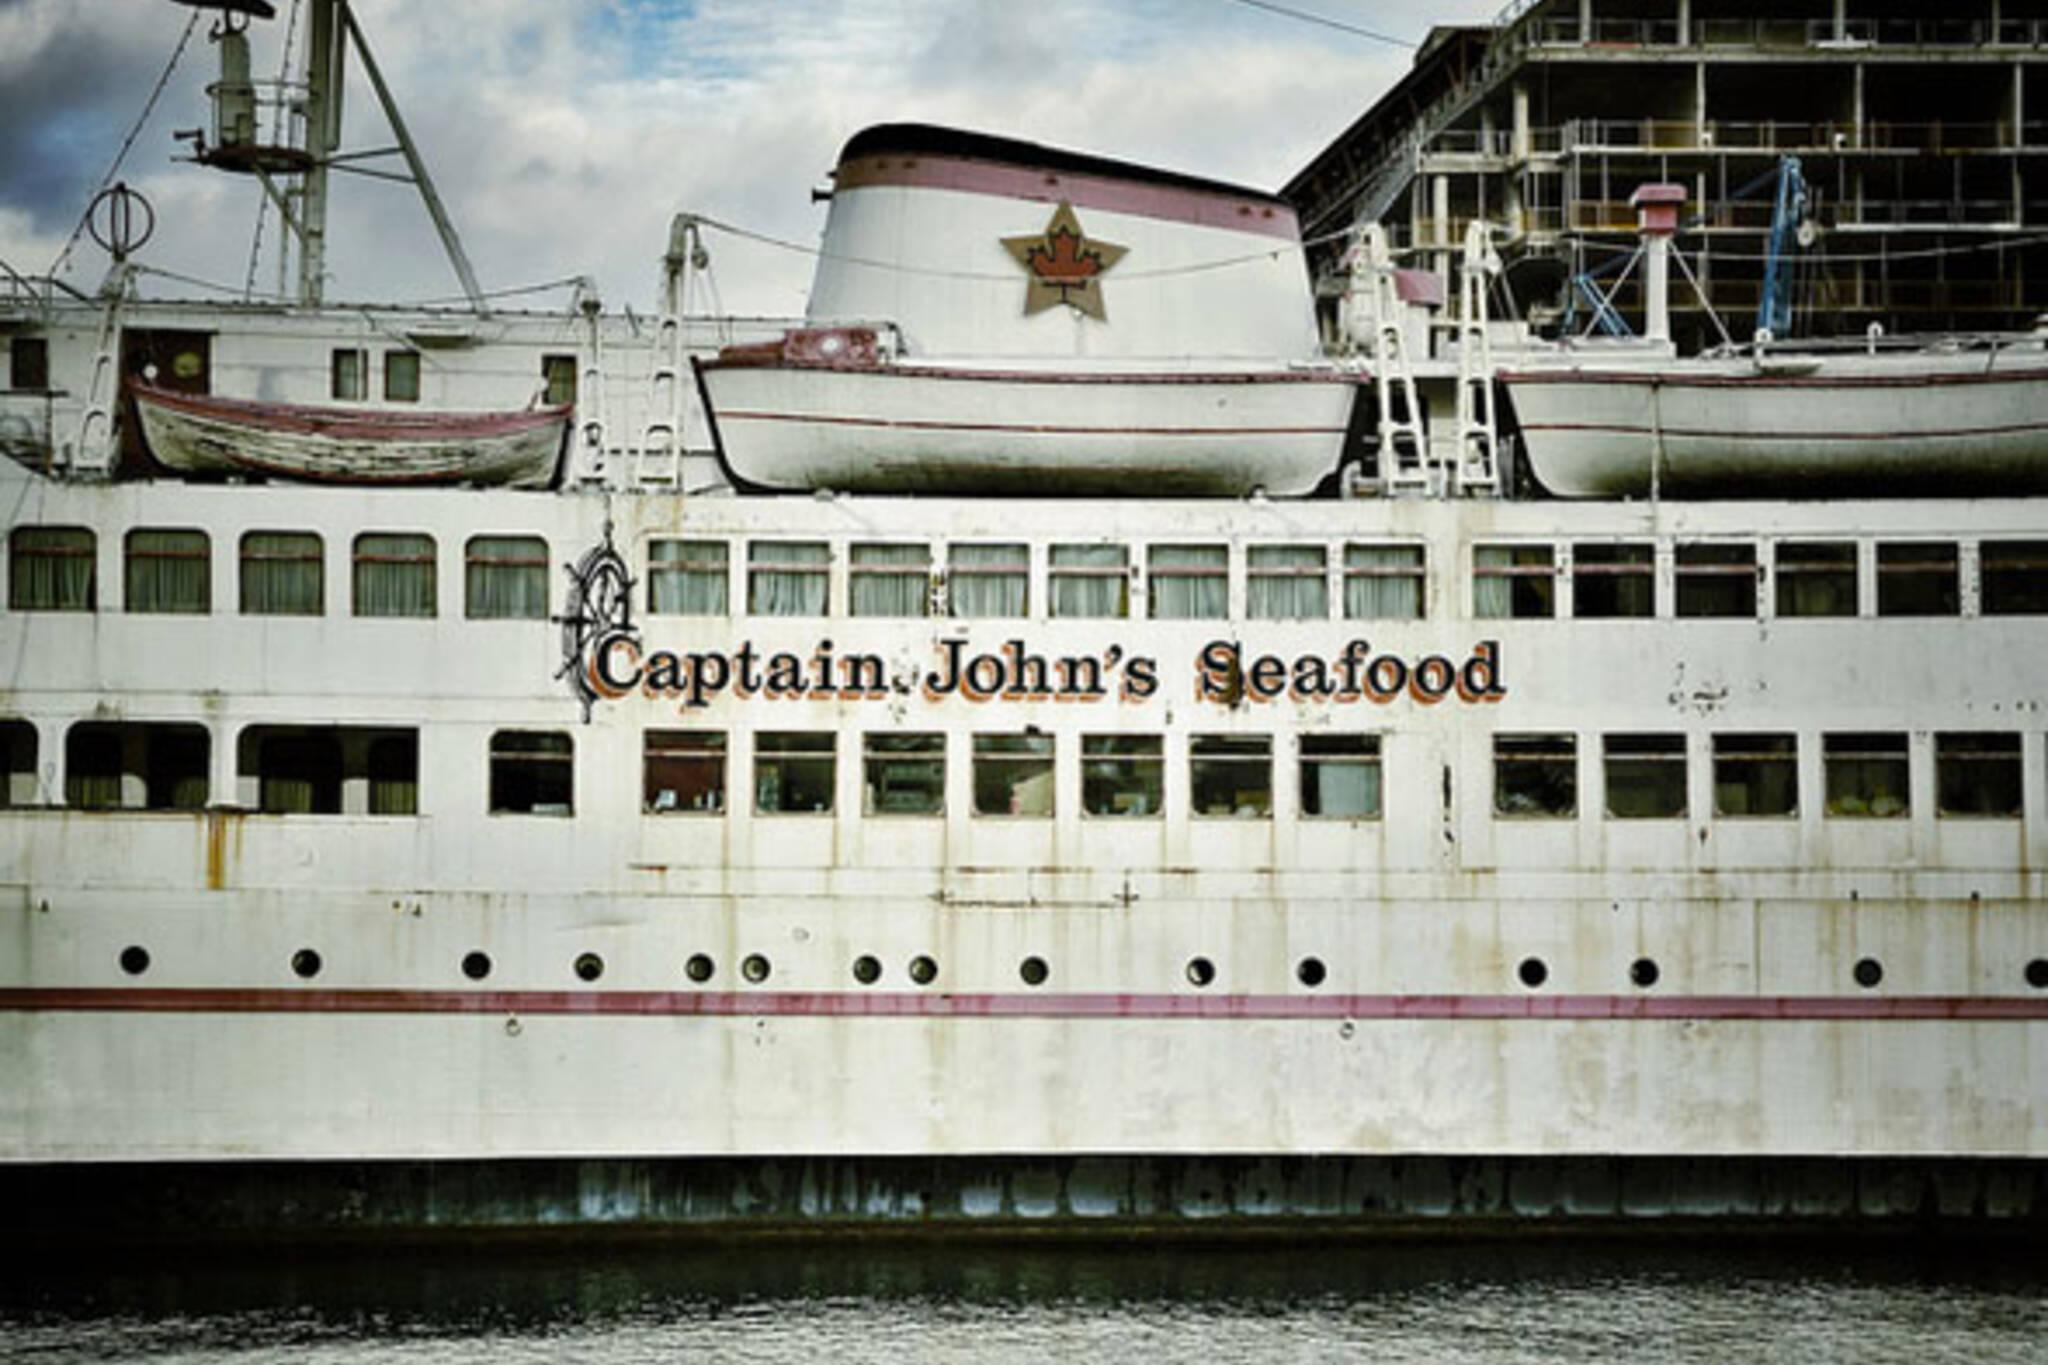 toronto captain john's